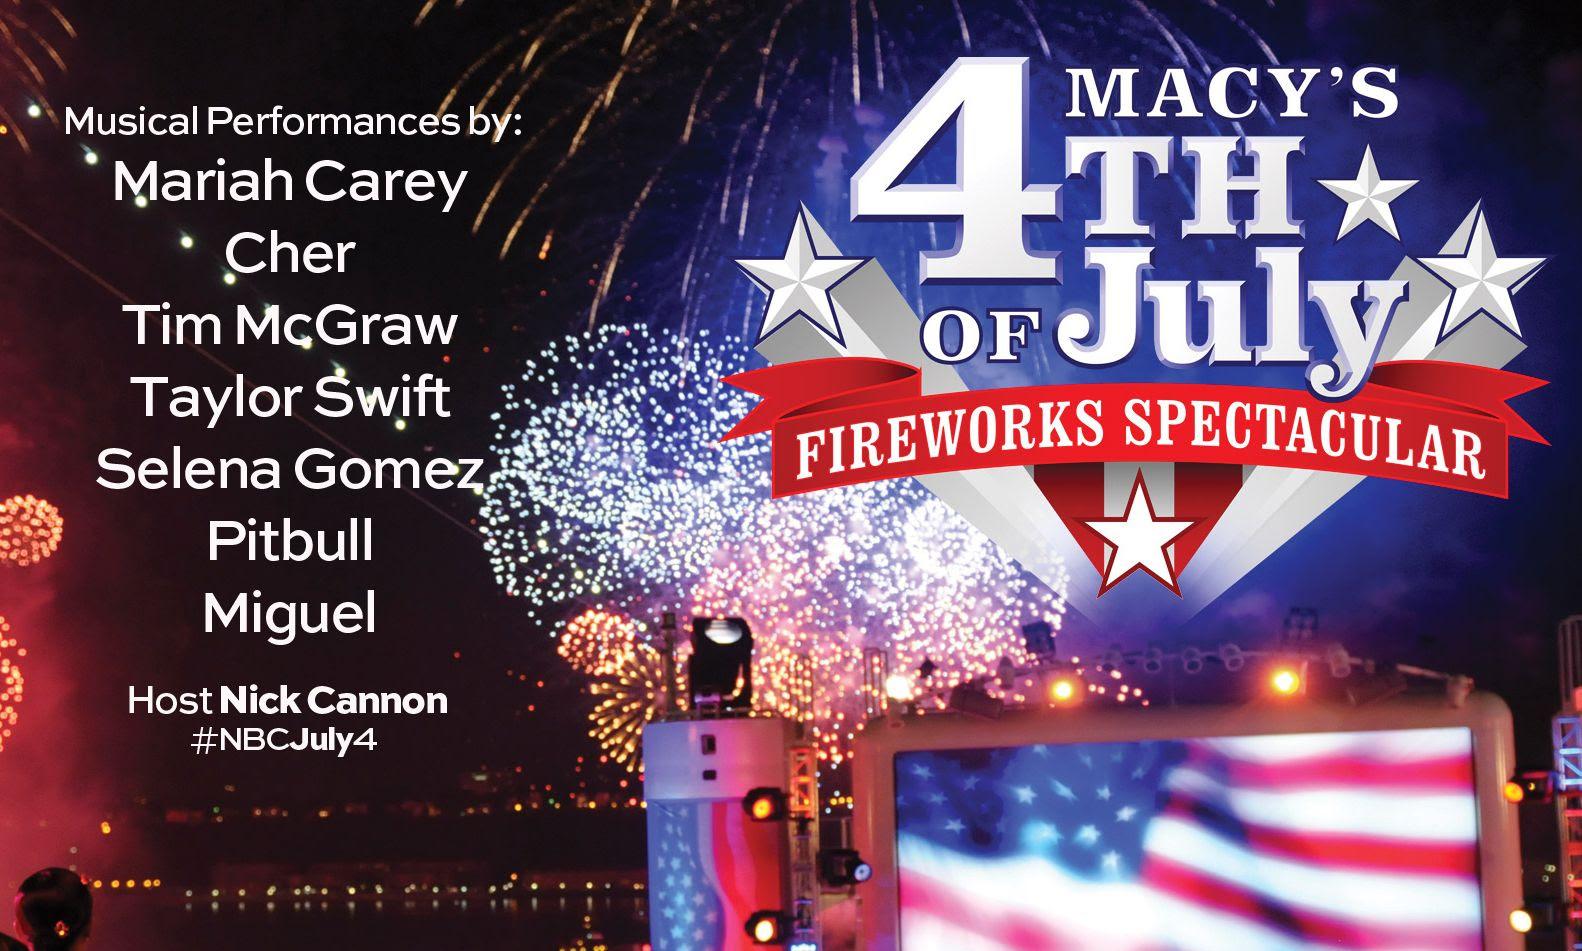 Macy's 4th of July (2013) photo macysbanner.jpg